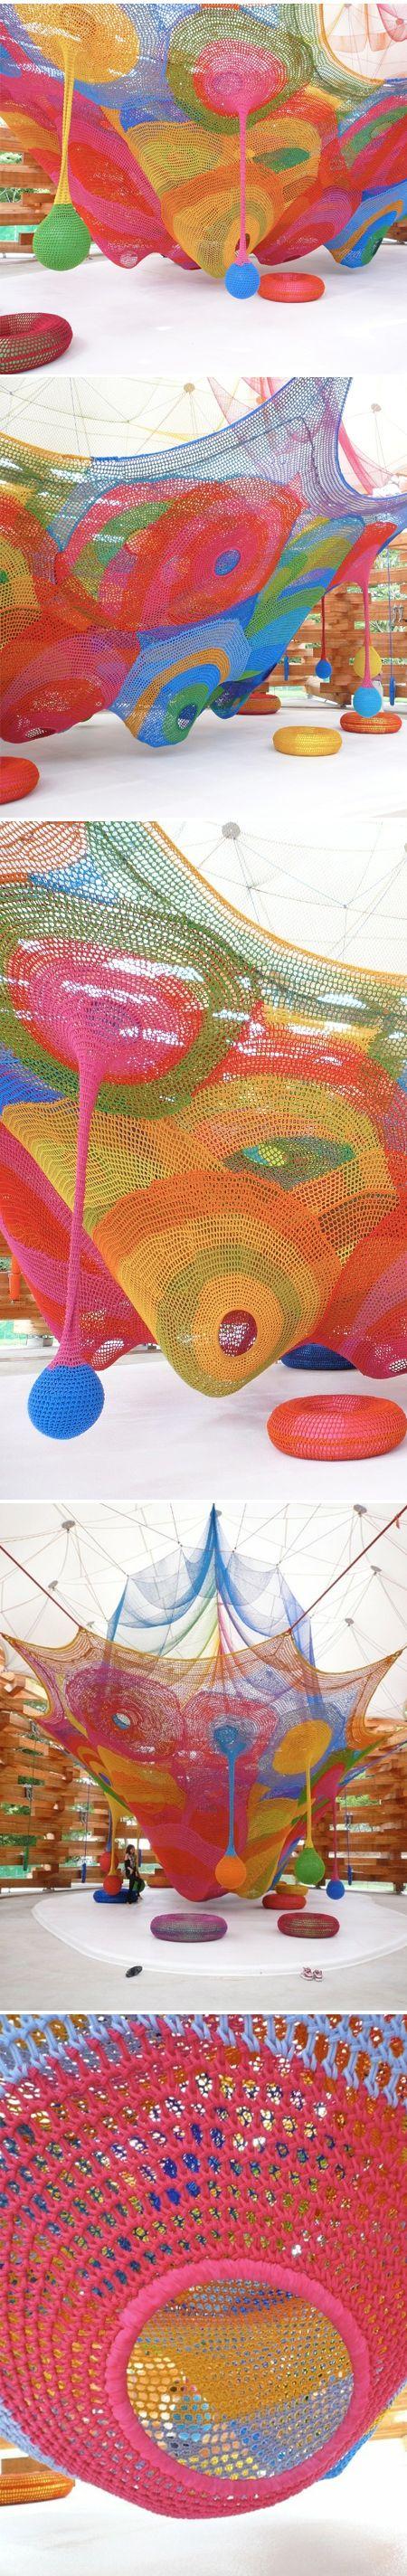 toshiko horiuchi macadam - installation at an open air art gallery in japan <3